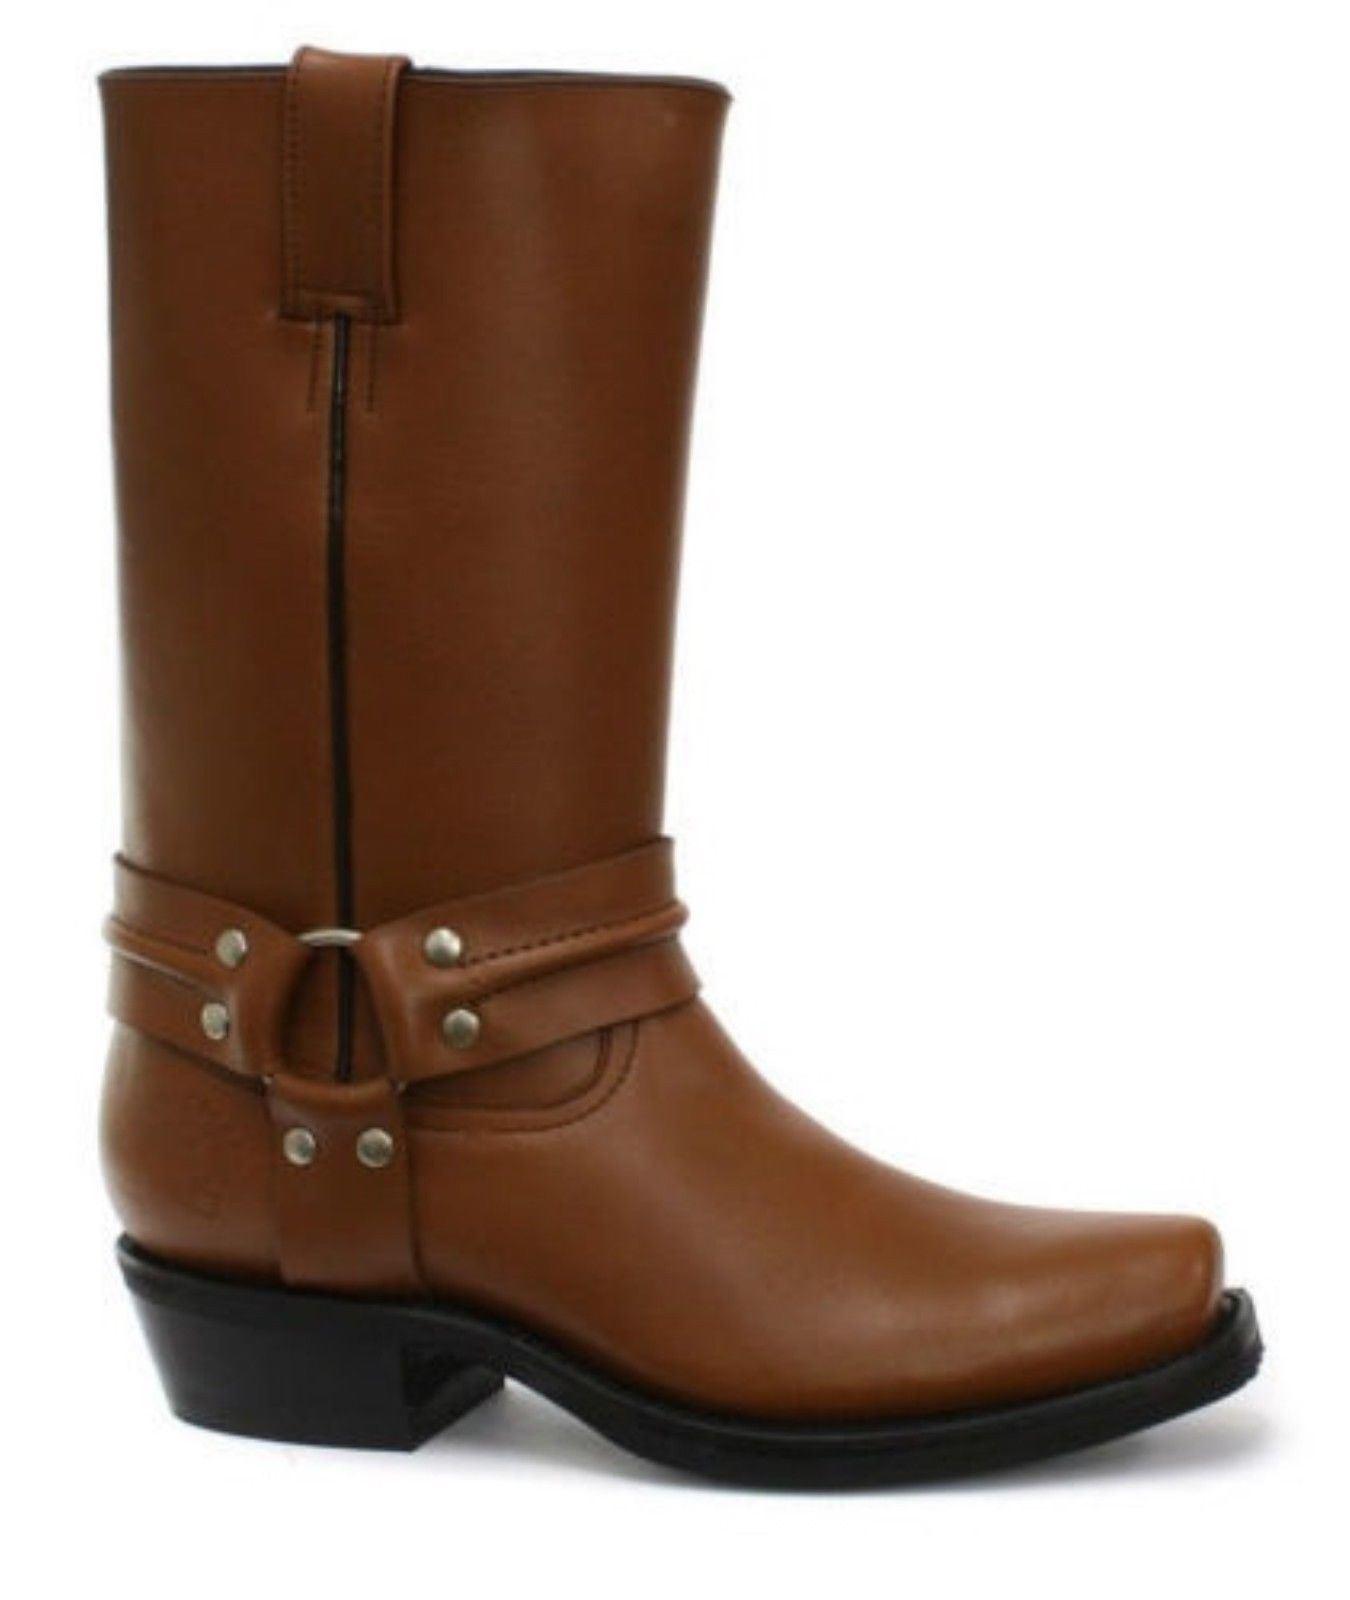 Grinders New Renegade Caoba Hi Biker Tan Caoba Renegade Beige  Leather Boots b0bdaf